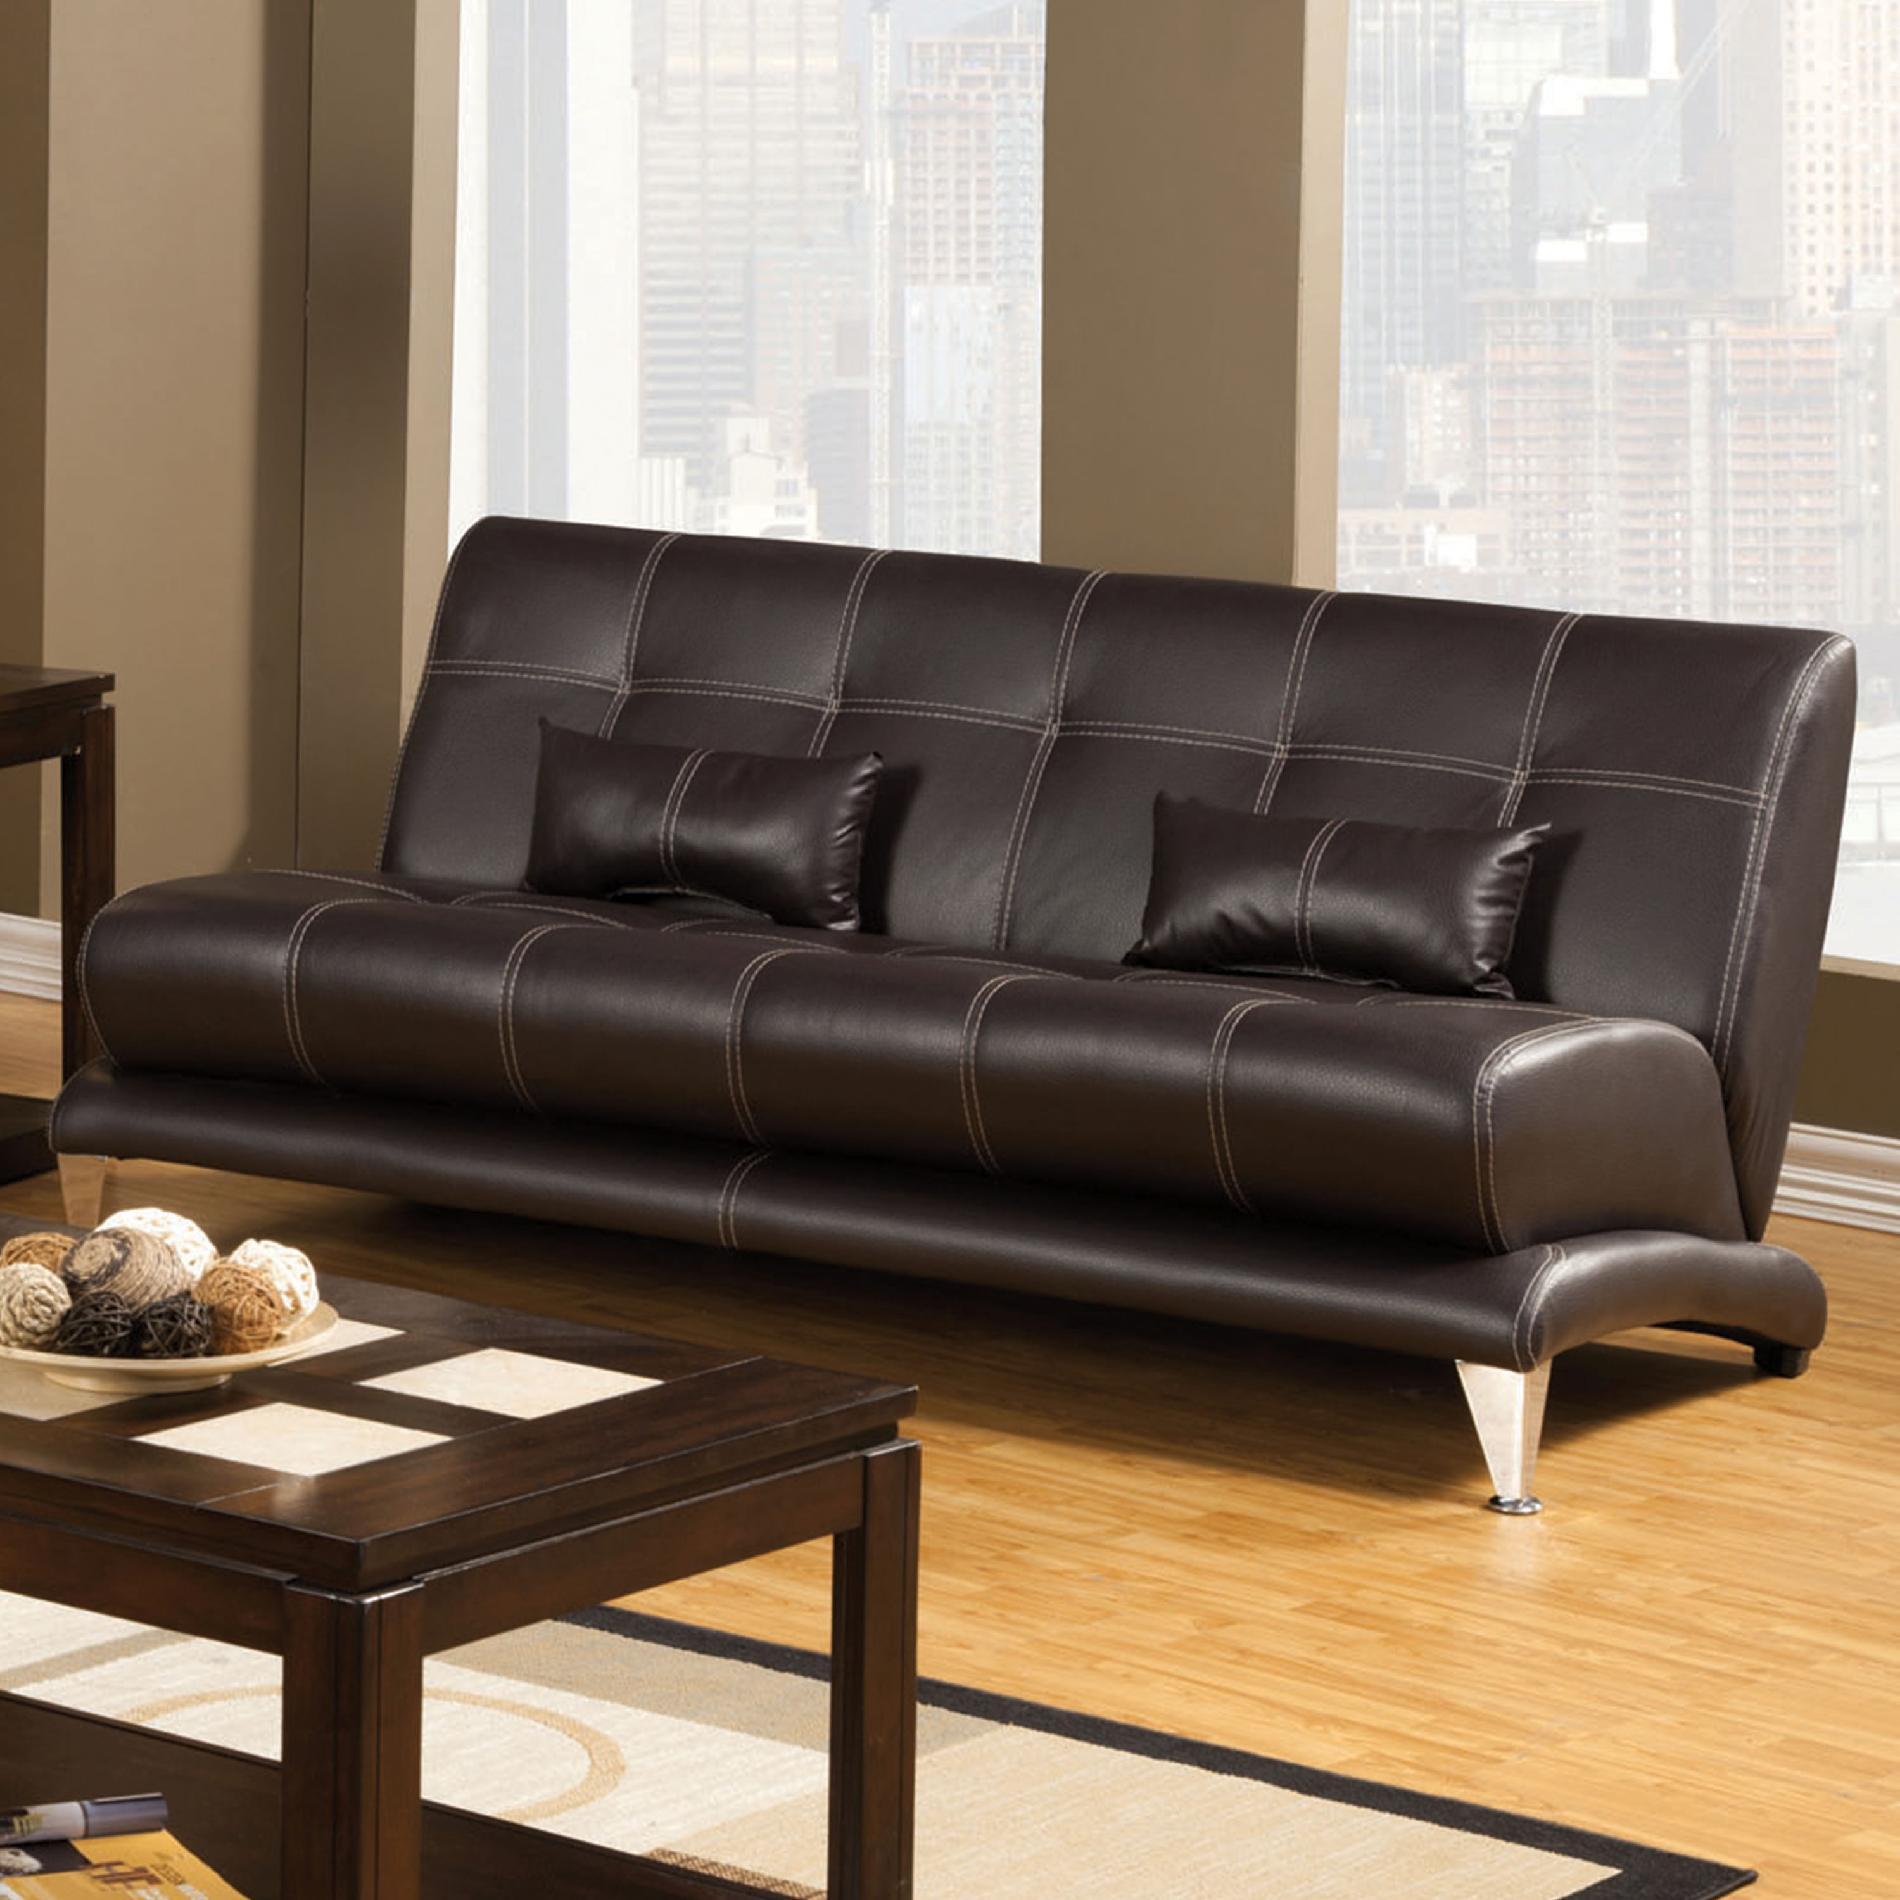 leatherette sofa buy cheap venetian worldwide artem chocolate brown